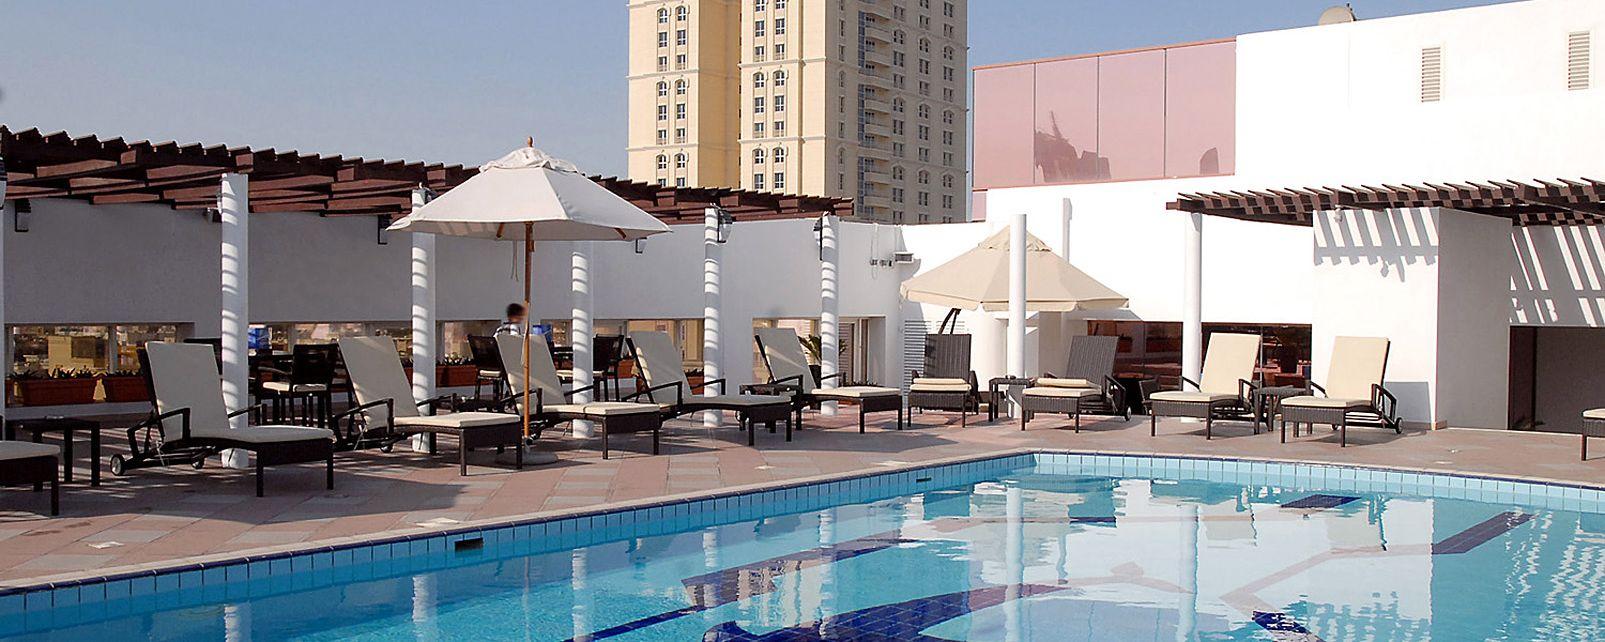 Hotel Jumeirah Beach Rotana